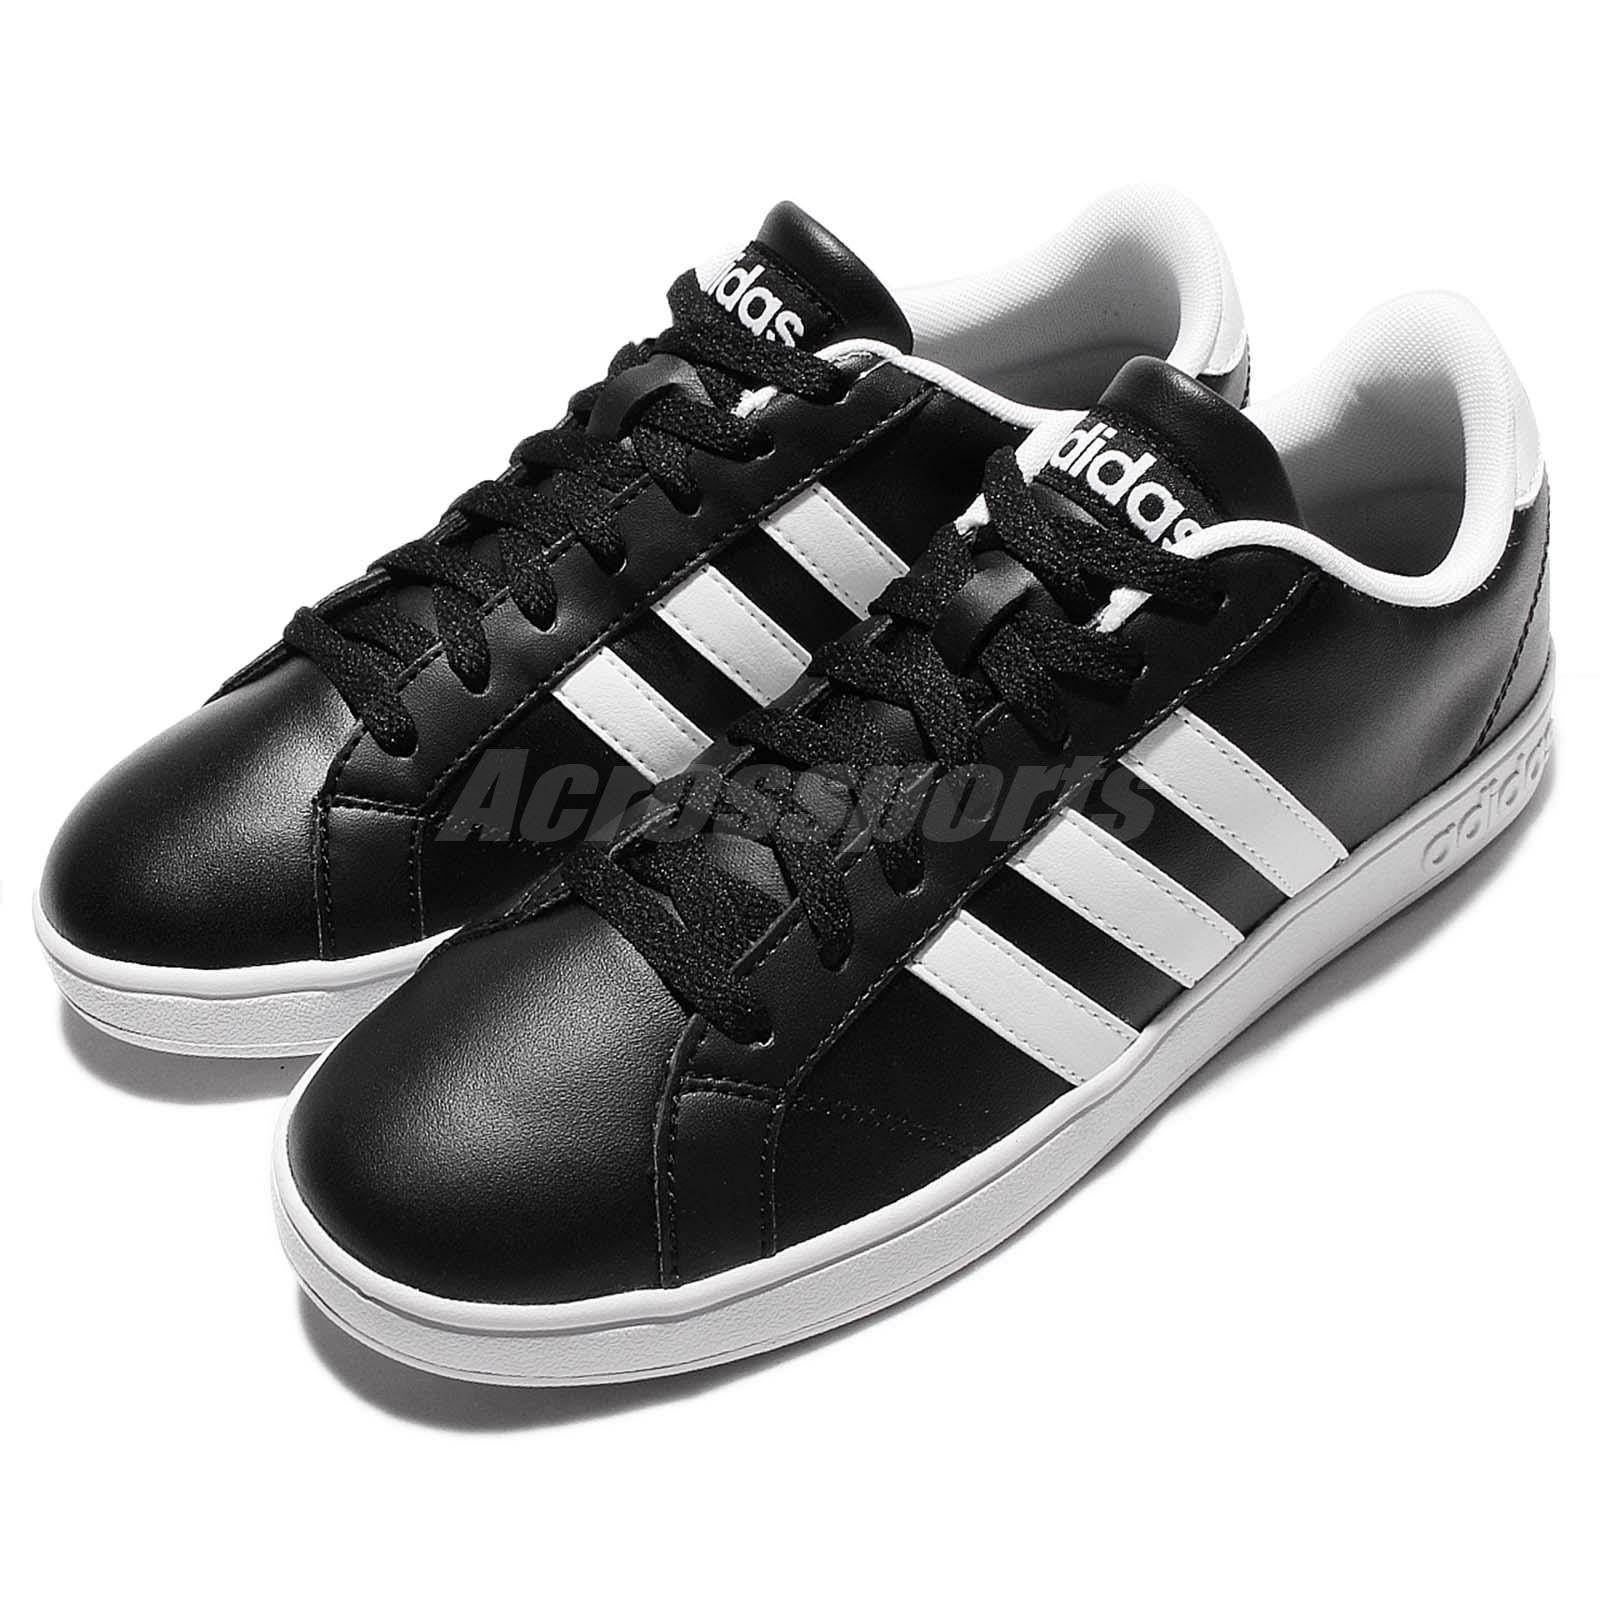 adidas neo label baseline black white mens casual shoes. Black Bedroom Furniture Sets. Home Design Ideas